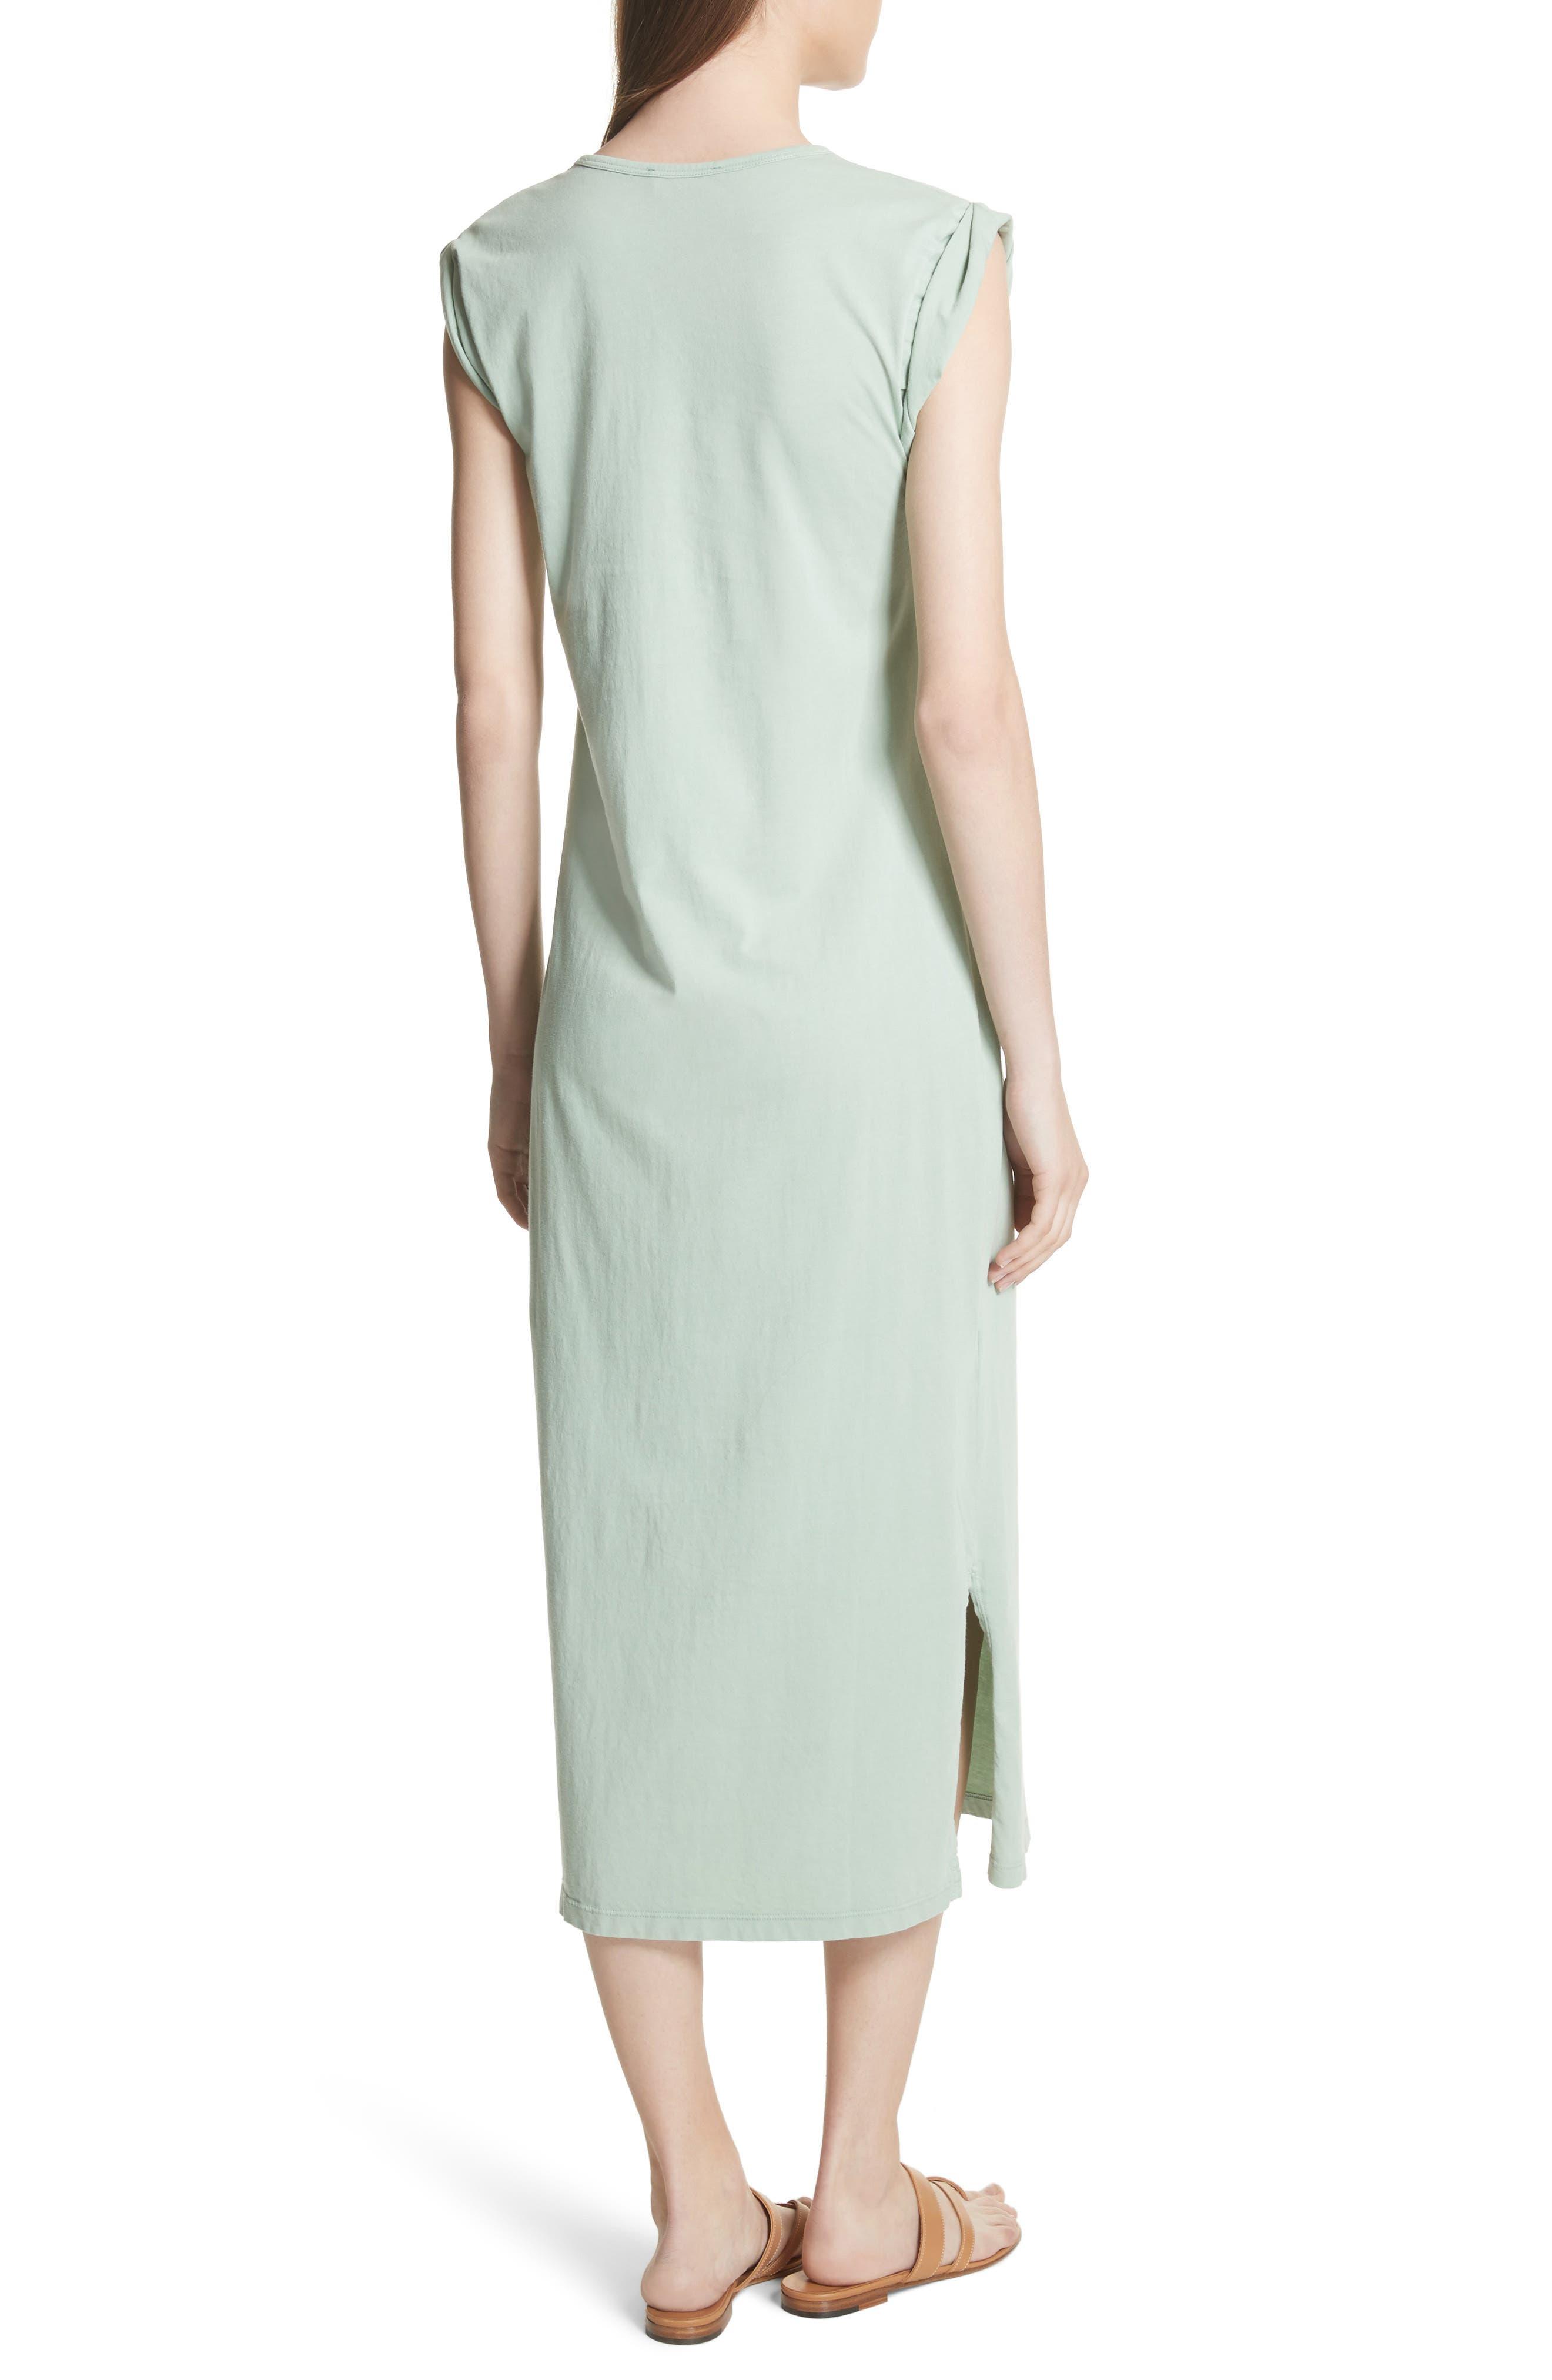 Muscle P Relaxed T-Shirt Dress,                             Alternate thumbnail 2, color,                             Light Moss